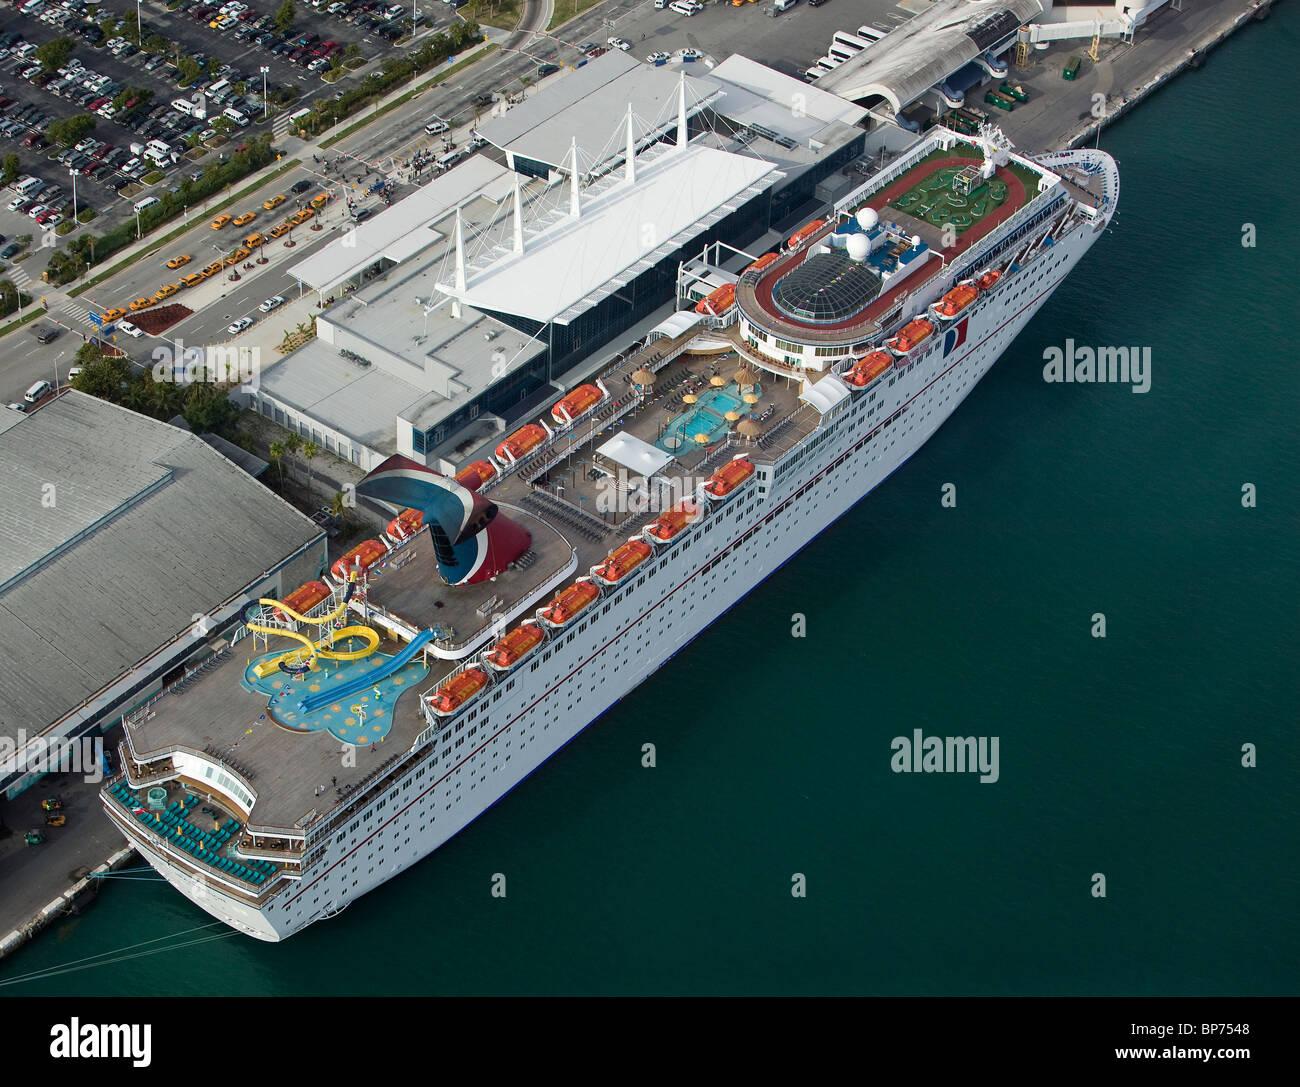 Port Of Miami Cruise Lines: Miami Cruise Port Stock Photos & Miami Cruise Port Stock